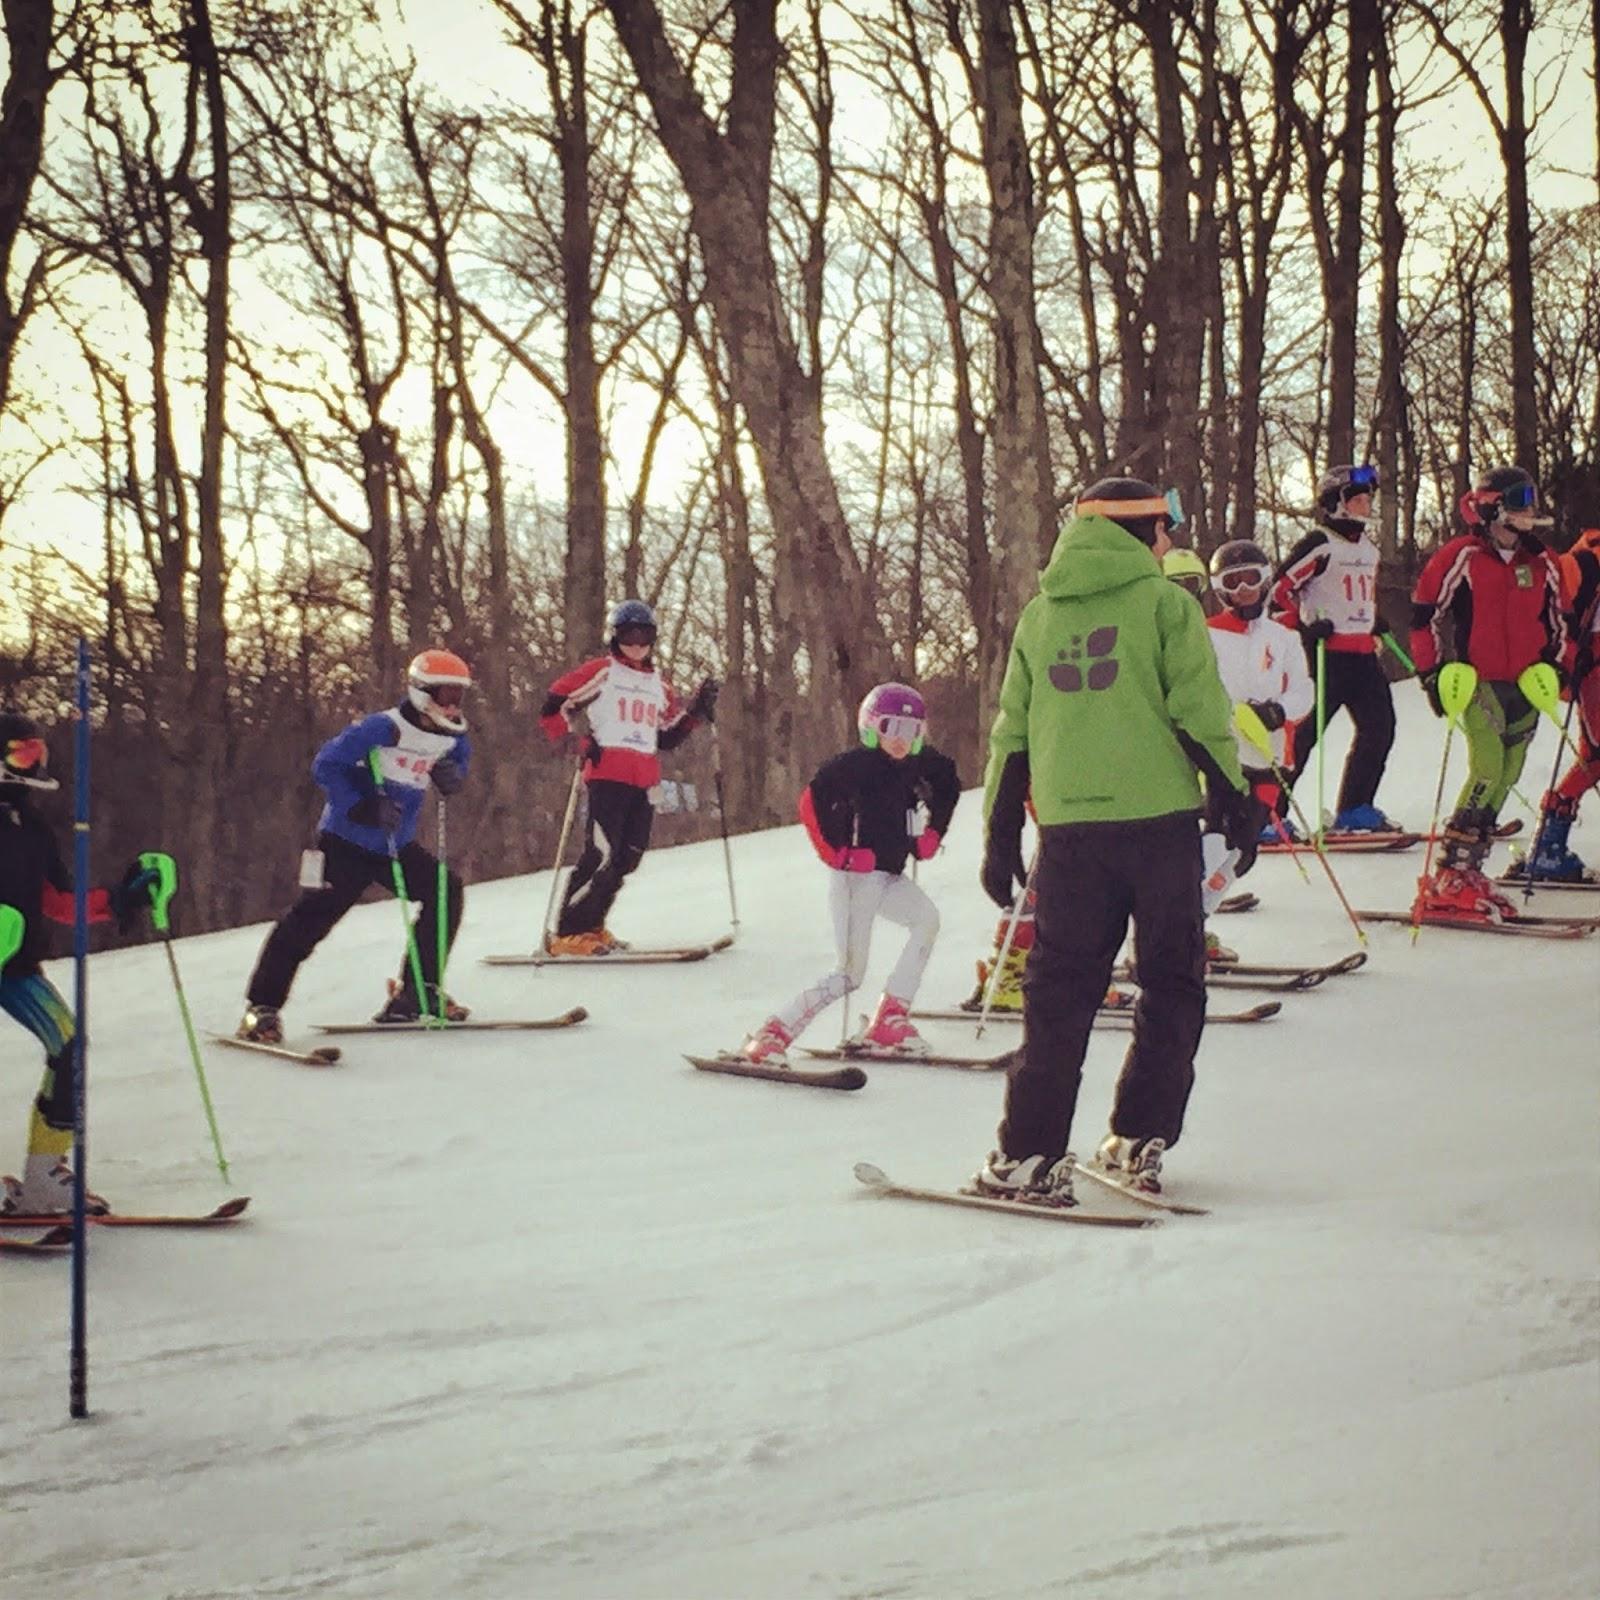 wintergreen resort, wintergreen ski race, ski team, racing, SARA